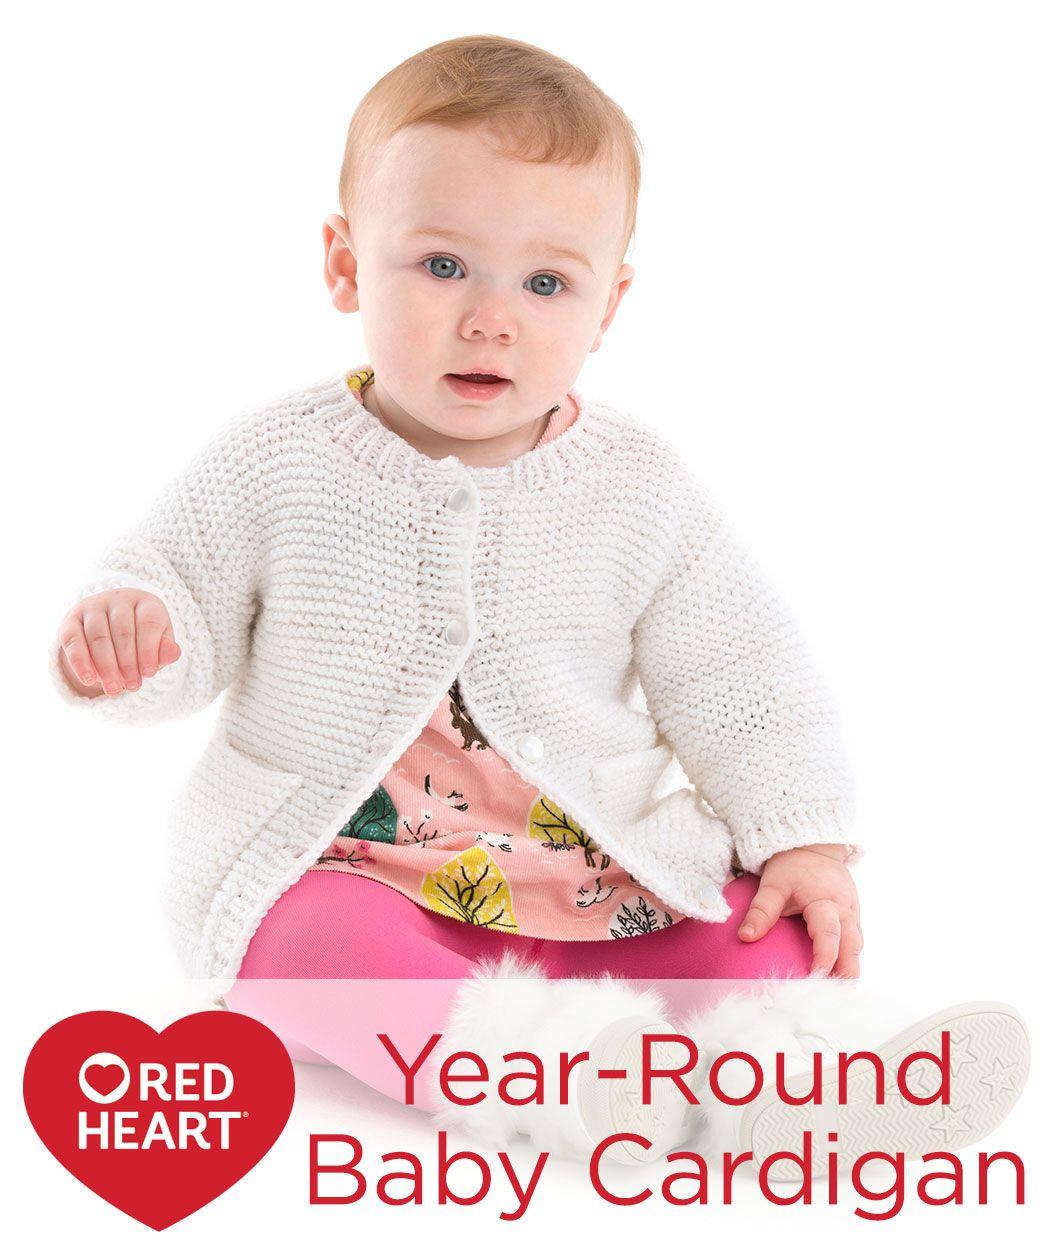 Year round baby cardigan free knitting pattern in red heart yarns year round baby cardigan free knitting pattern in red heart yarns knit a bankloansurffo Gallery